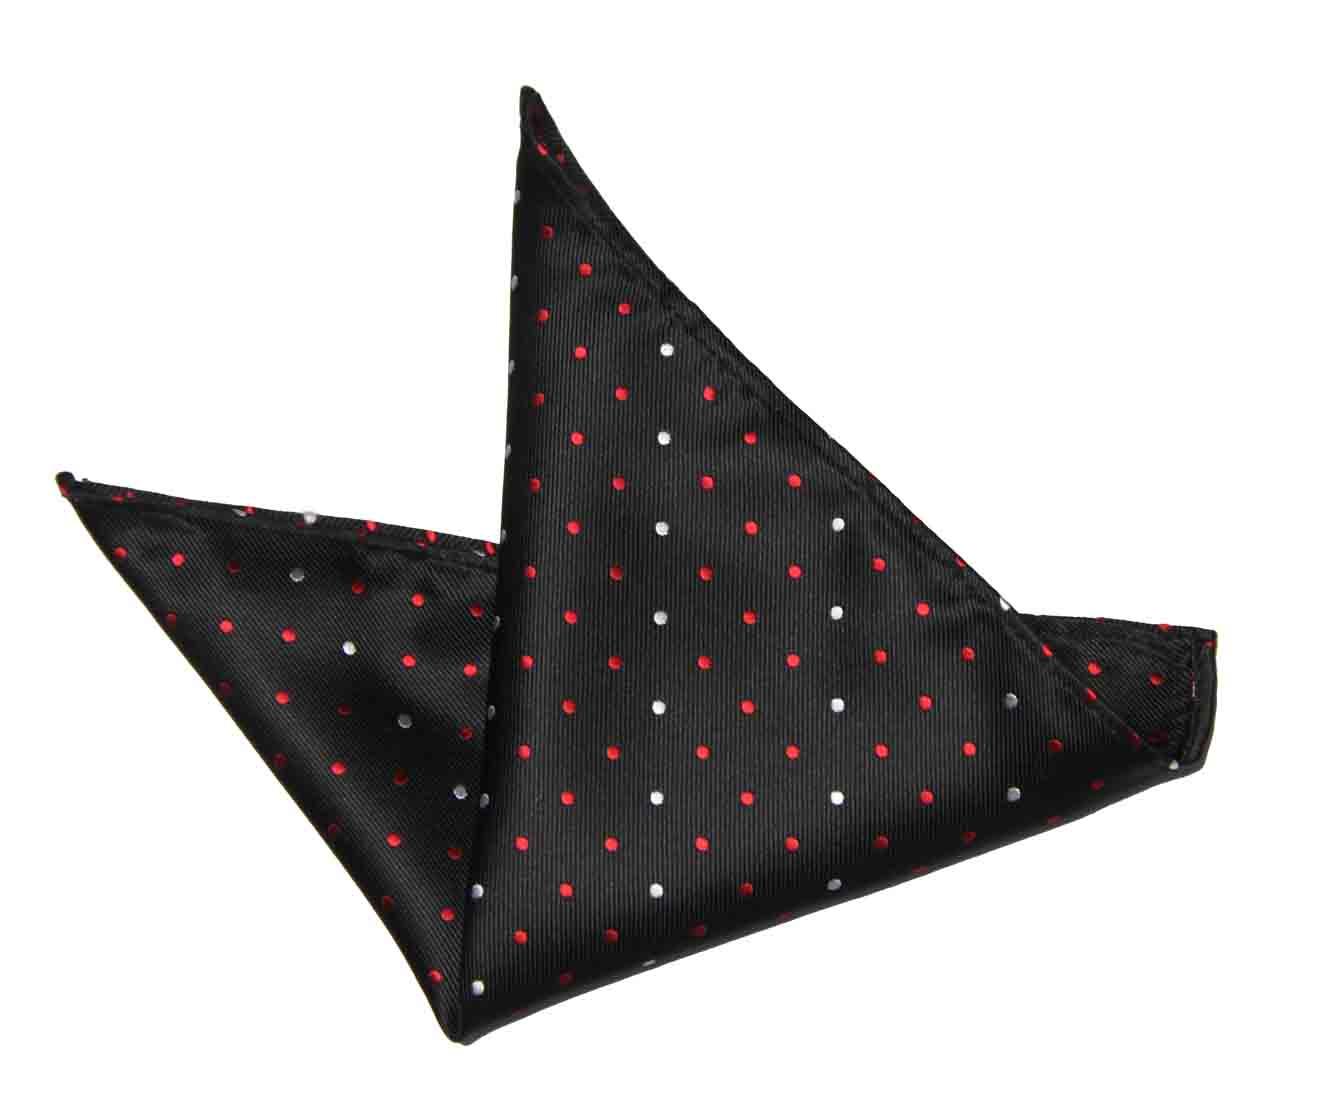 ekSel Pocket Square Black Red White Polka Dot Men's